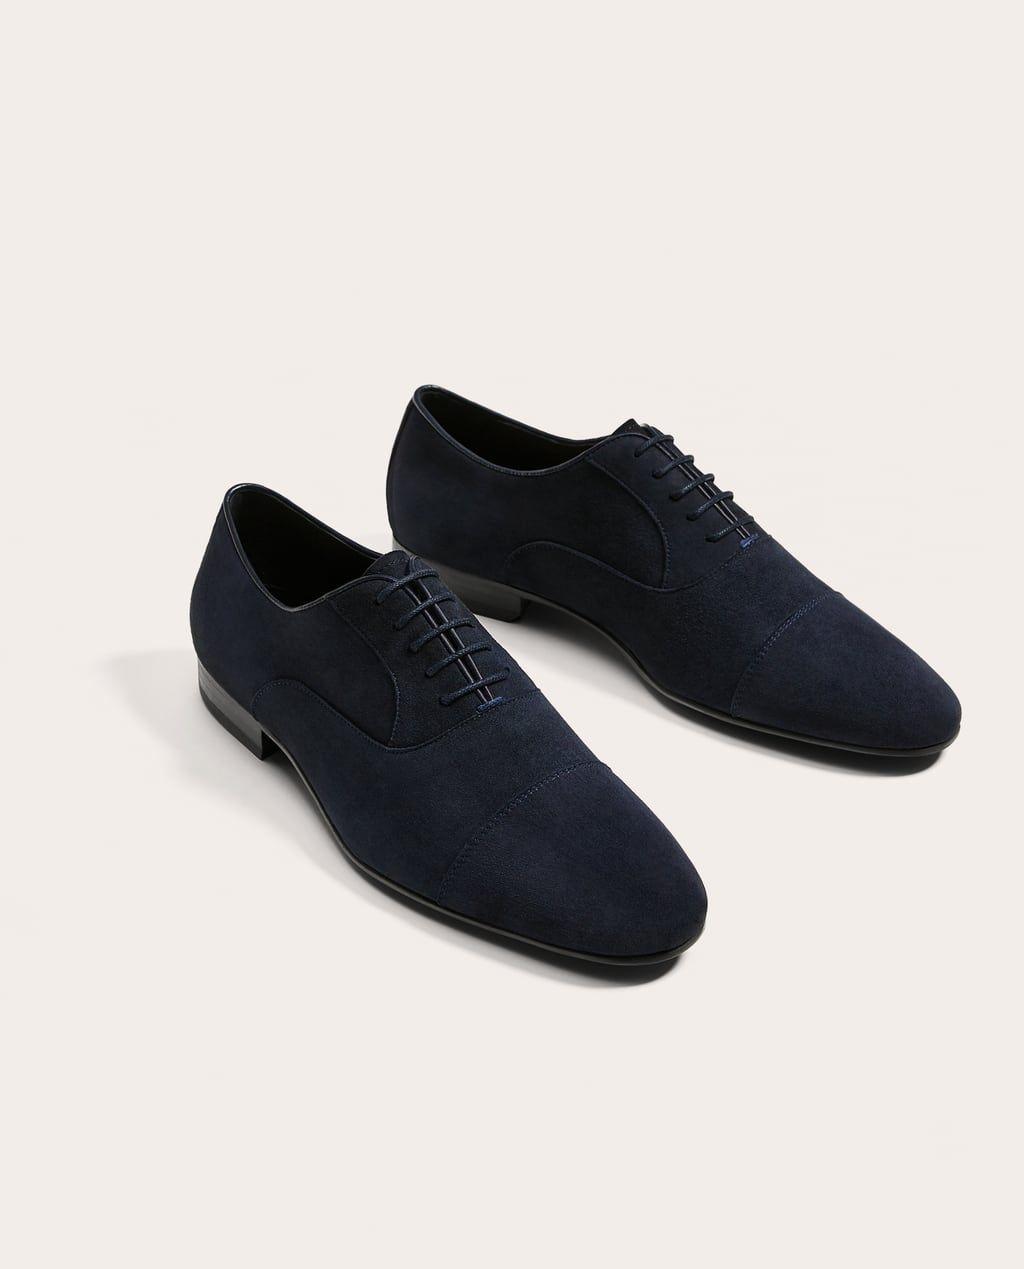 ClassyDude - Zapatillas de Material Sintético para hombre Negro azul marino qCGlltD8